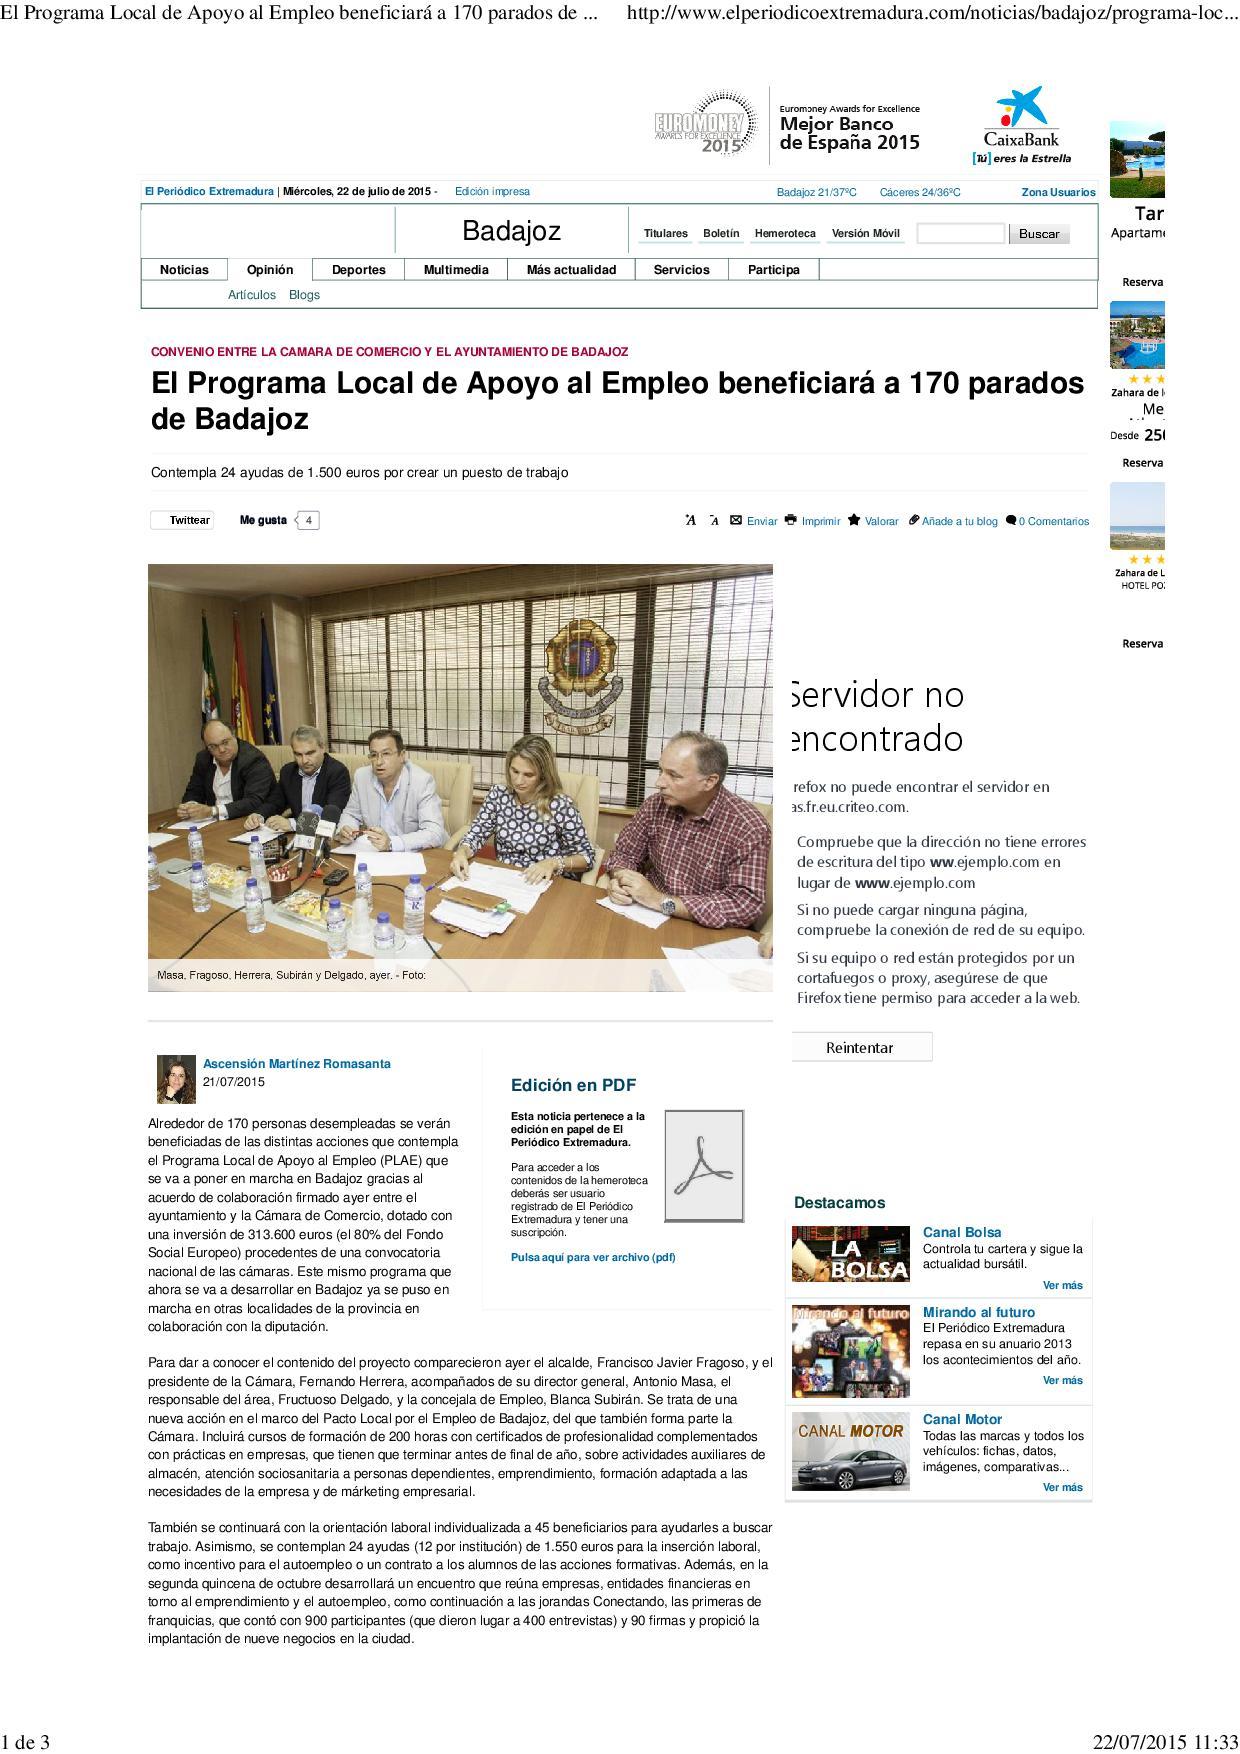 2015-07-20_elperiodicoextremadura_com